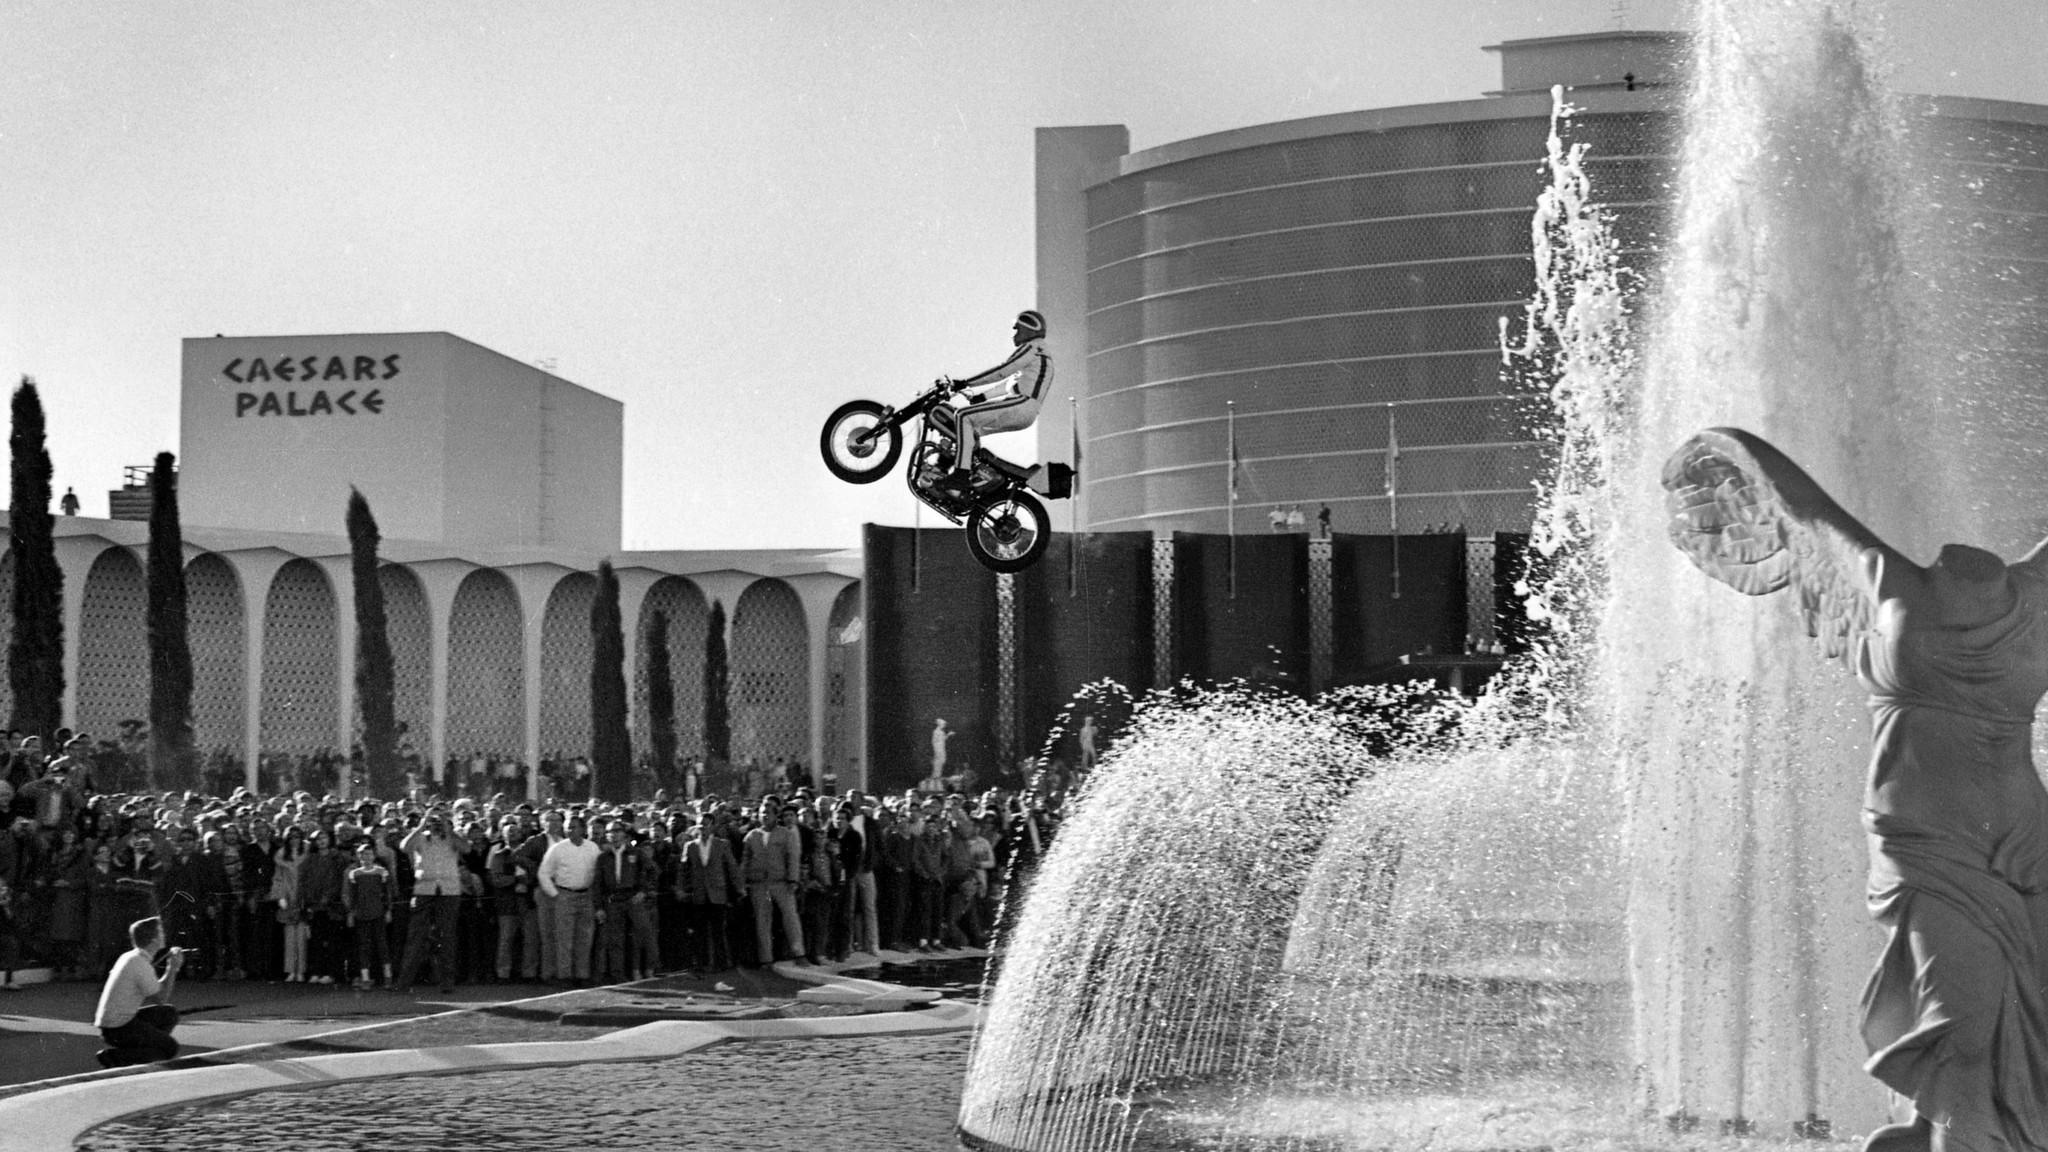 Kansas museum honors Evel Knievel, - 598.0KB